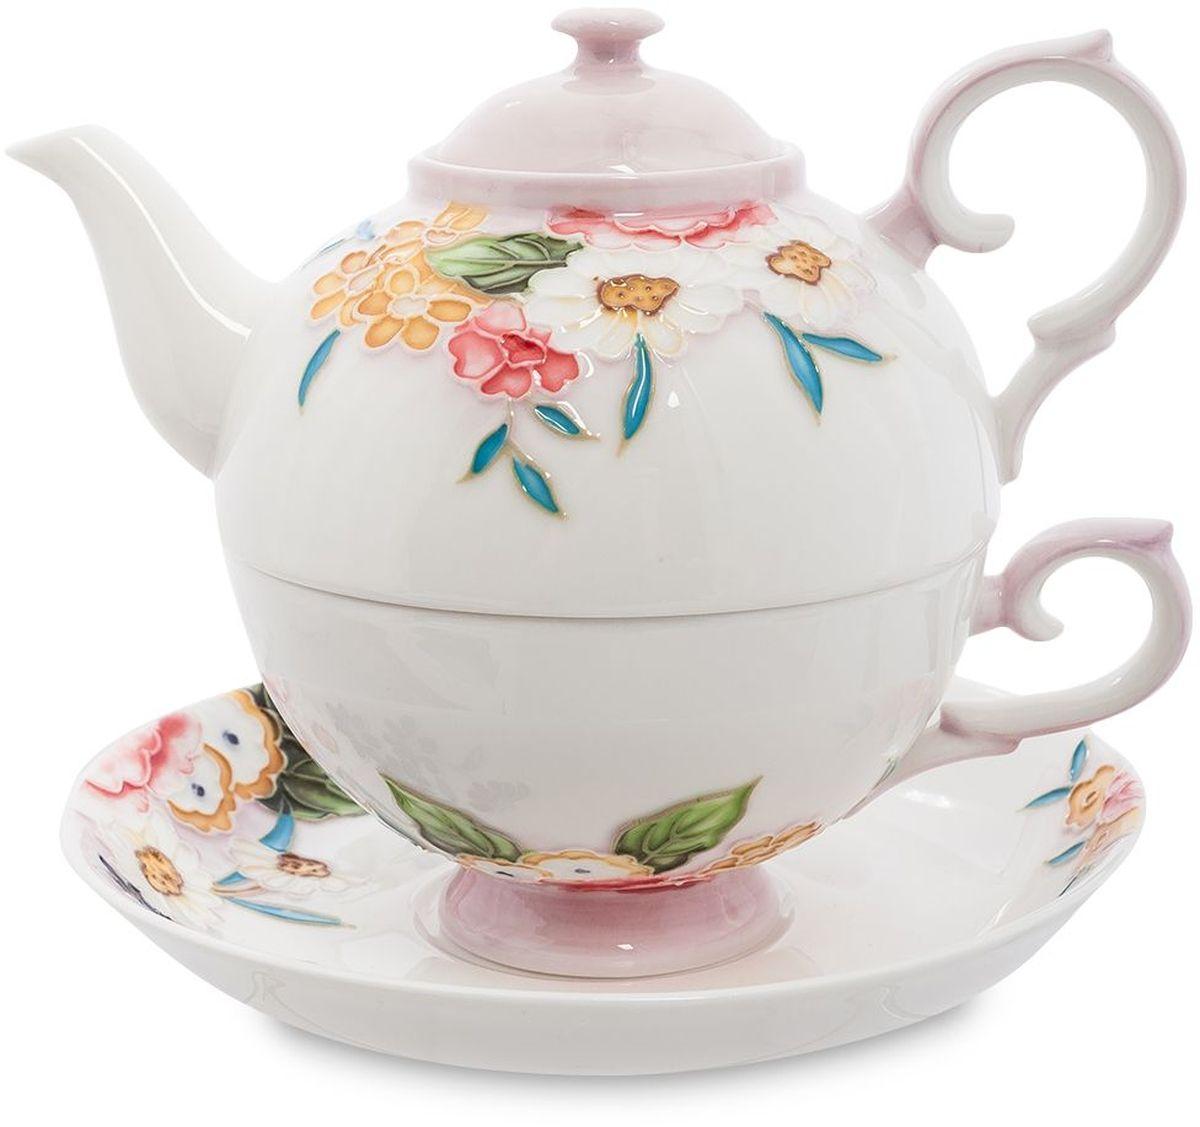 Набор чайный Pavone Королева Камилла, 3 предмета. 451592115510Объем чайника: 400 млОбъем чаши: 250 млДиаметр блюдца: 15 см